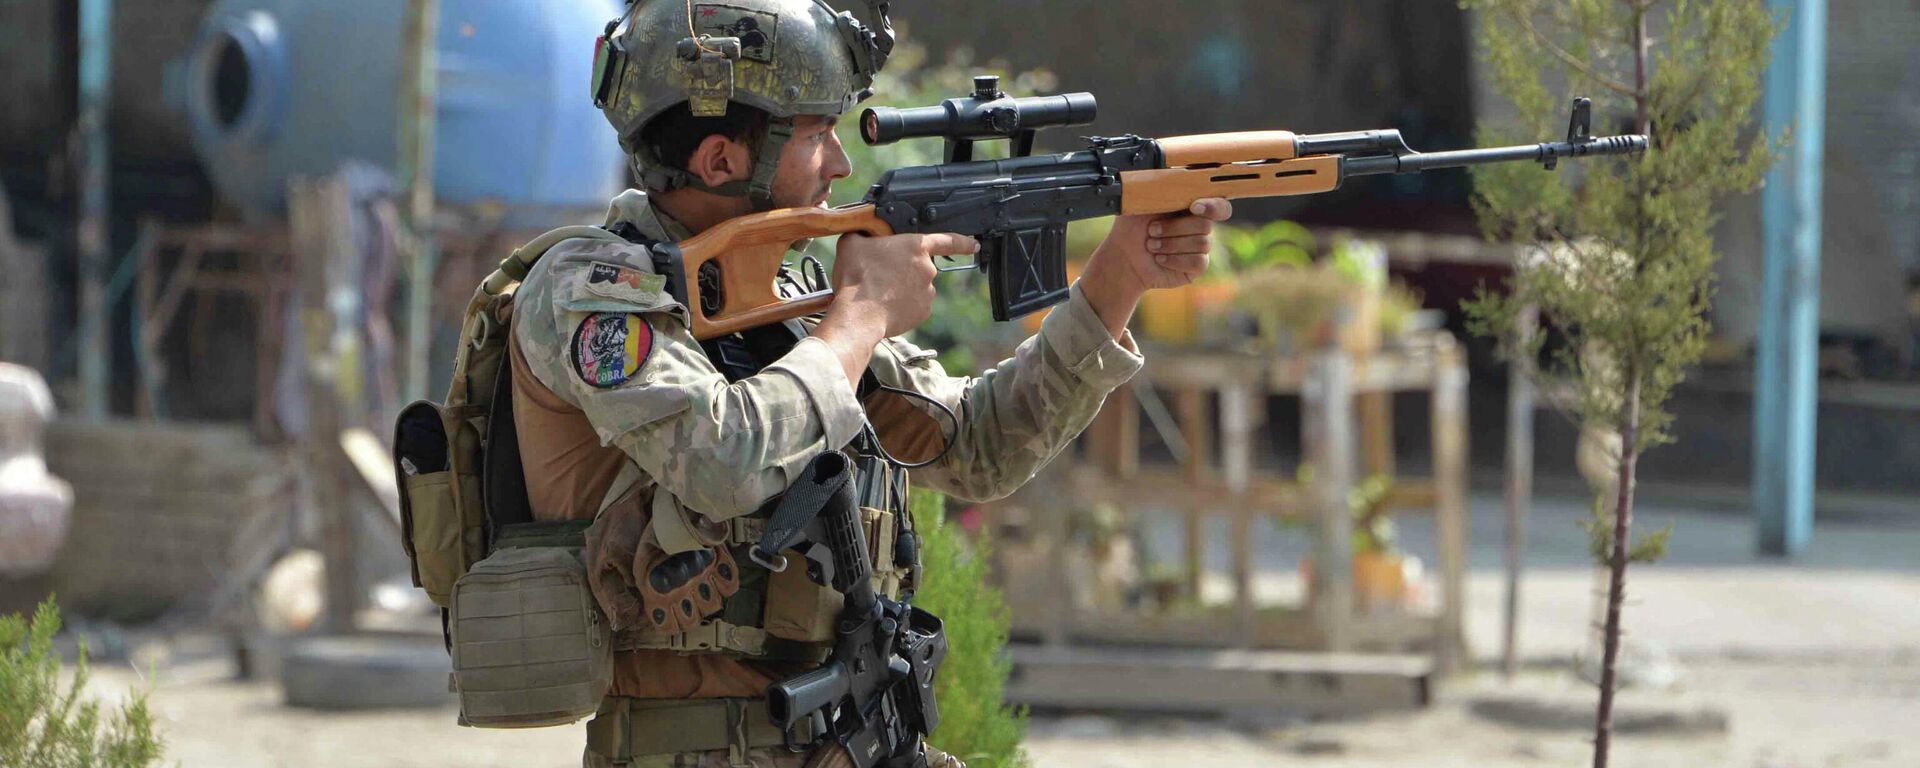 Soldado afgano en Jalalabad, Afganistán - Sputnik Mundo, 1920, 15.08.2021